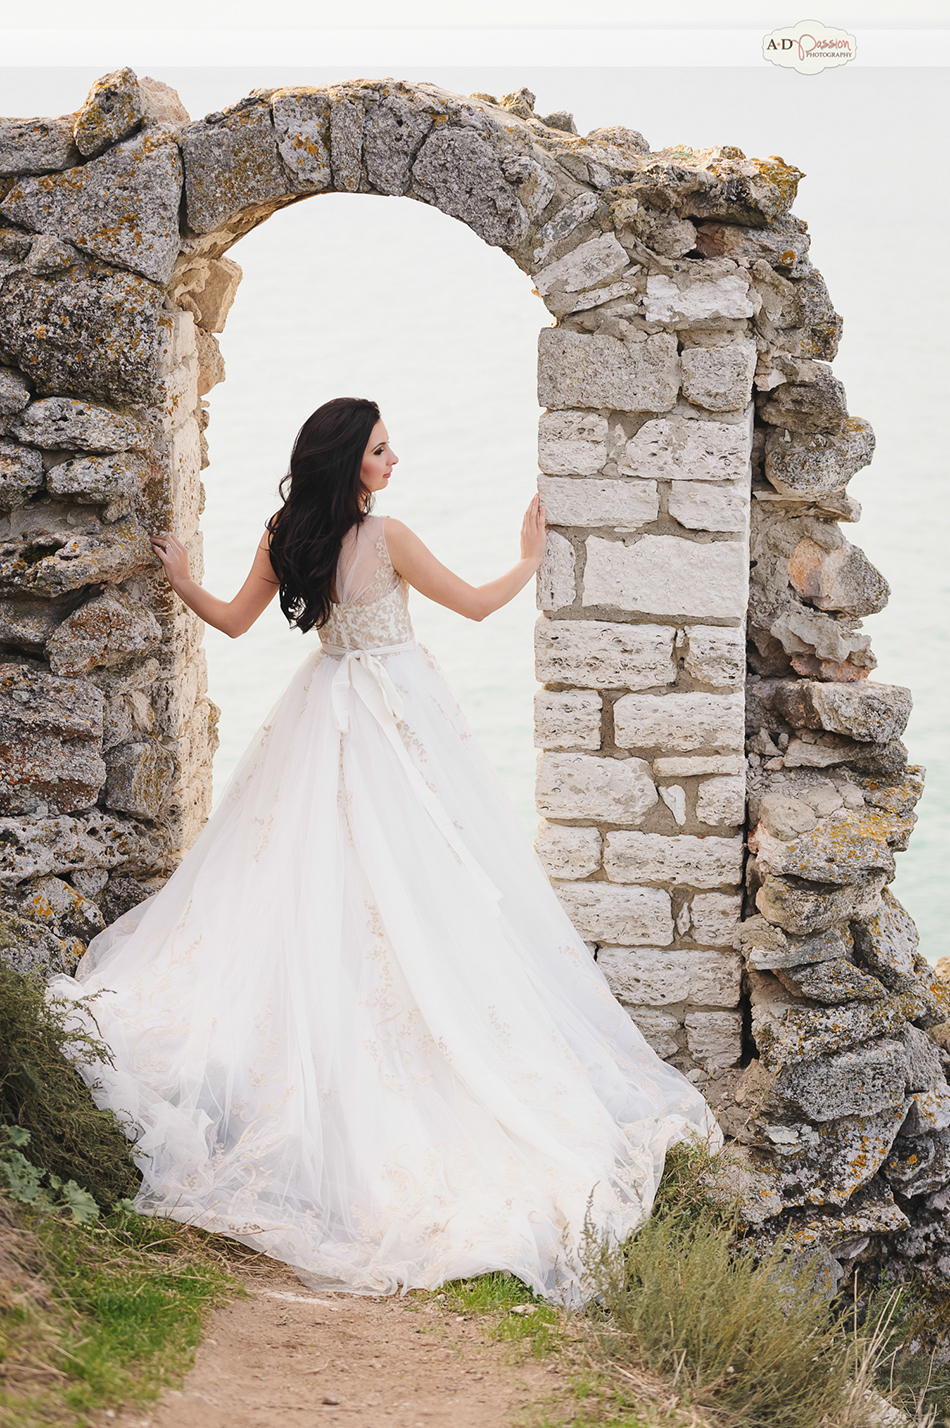 AD Passion Photography | 20131008_fotograf-nunta-profesionist_after-wedding-balchik_razvan-si-eliza_0018 | Adelin, Dida, fotograf profesionist, fotograf de nunta, fotografie de nunta, fotograf Timisoara, fotograf Craiova, fotograf Bucuresti, fotograf Arad, nunta Timisoara, nunta Arad, nunta Bucuresti, nunta Craiova